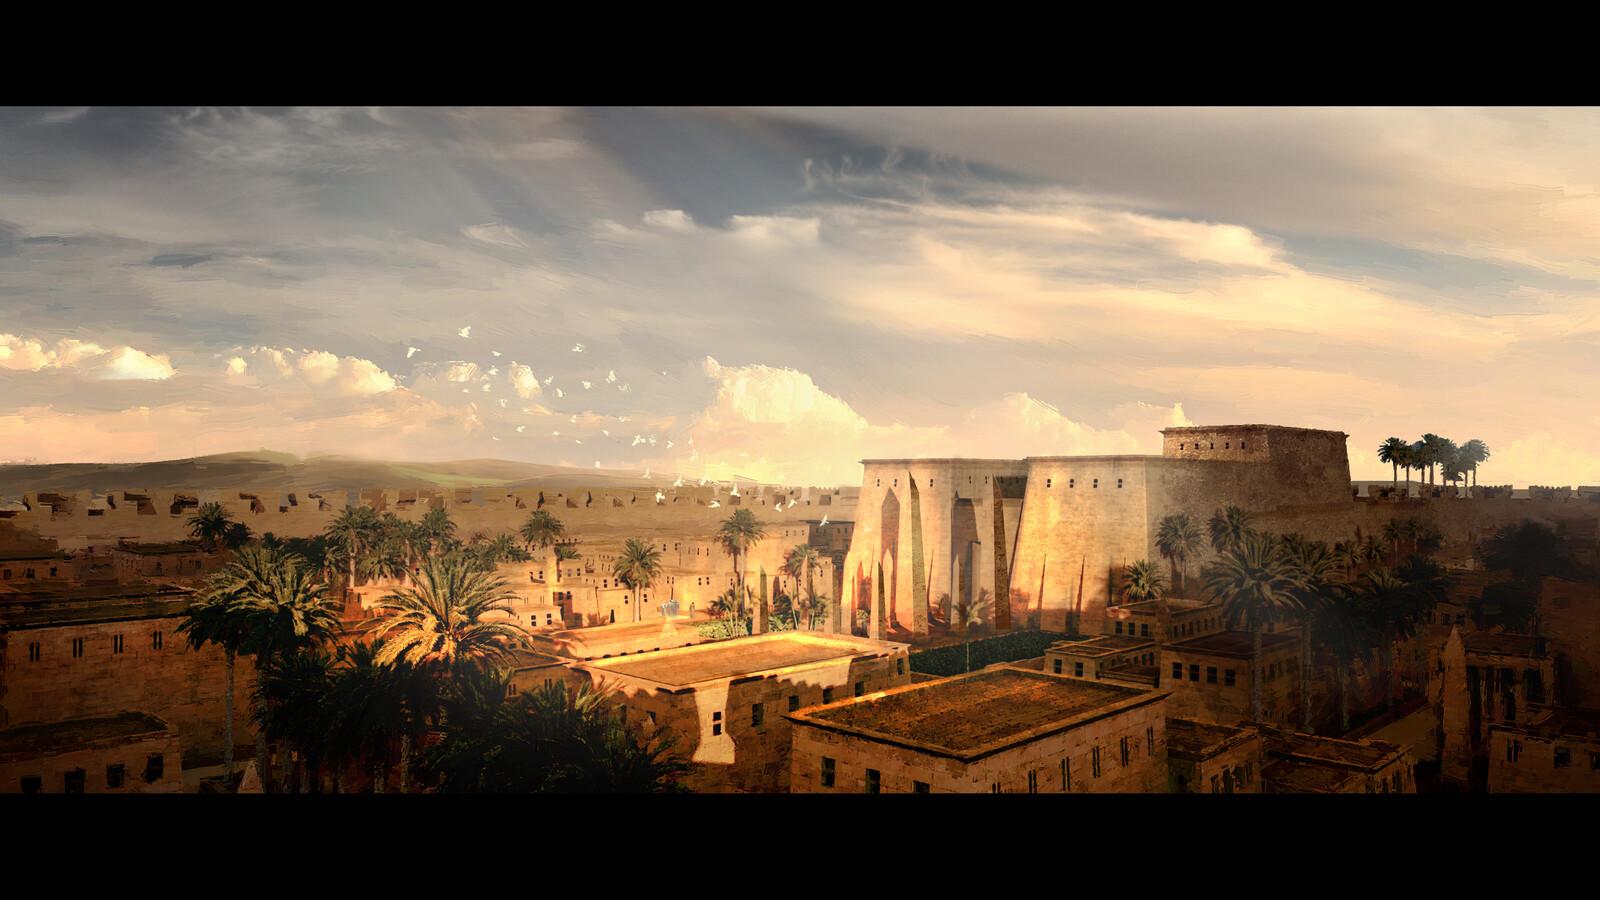 Egyptian Citadel